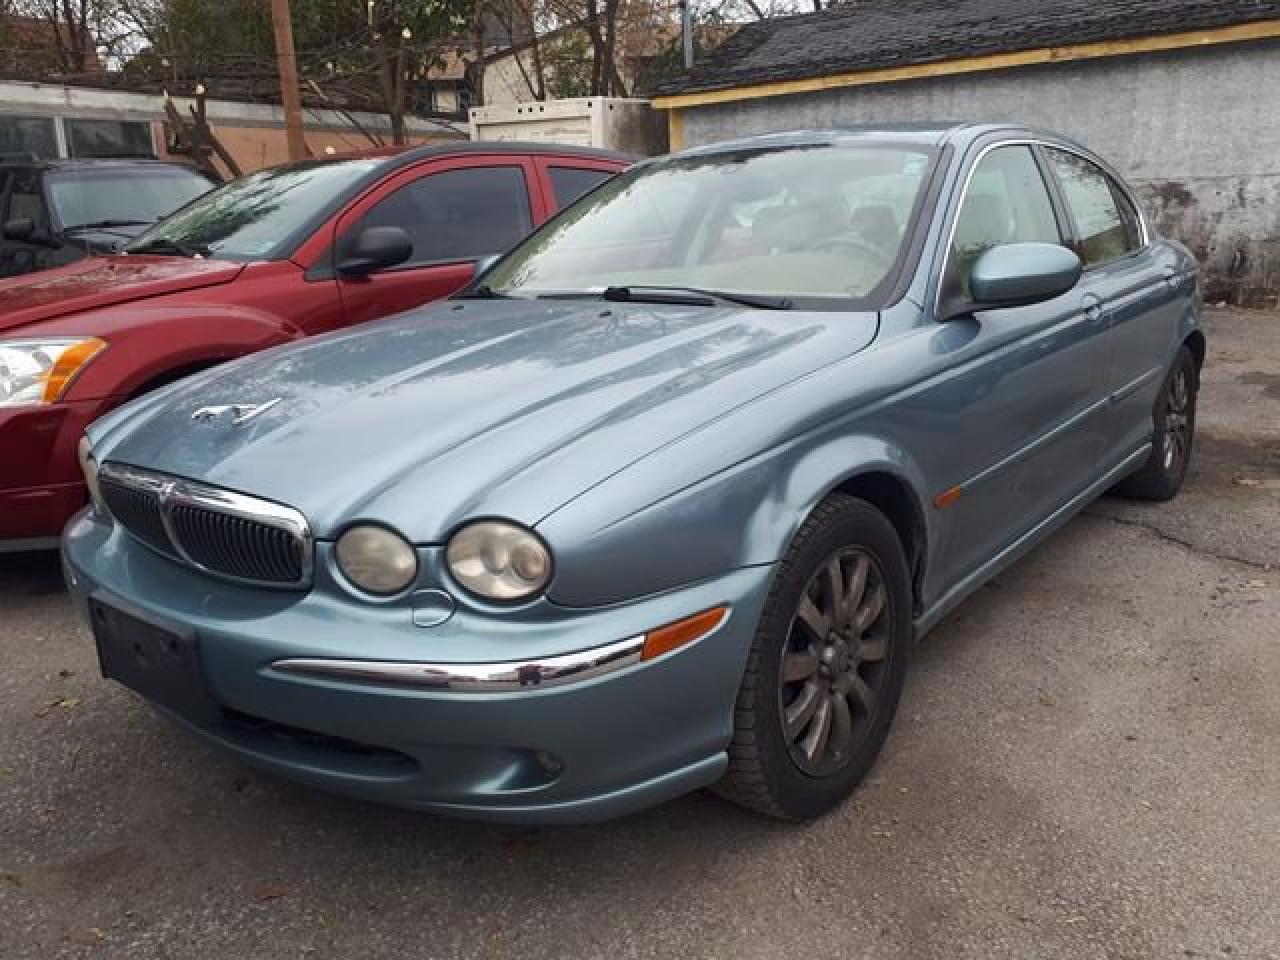 2003 Jaguar X-Type as traded/drives OK